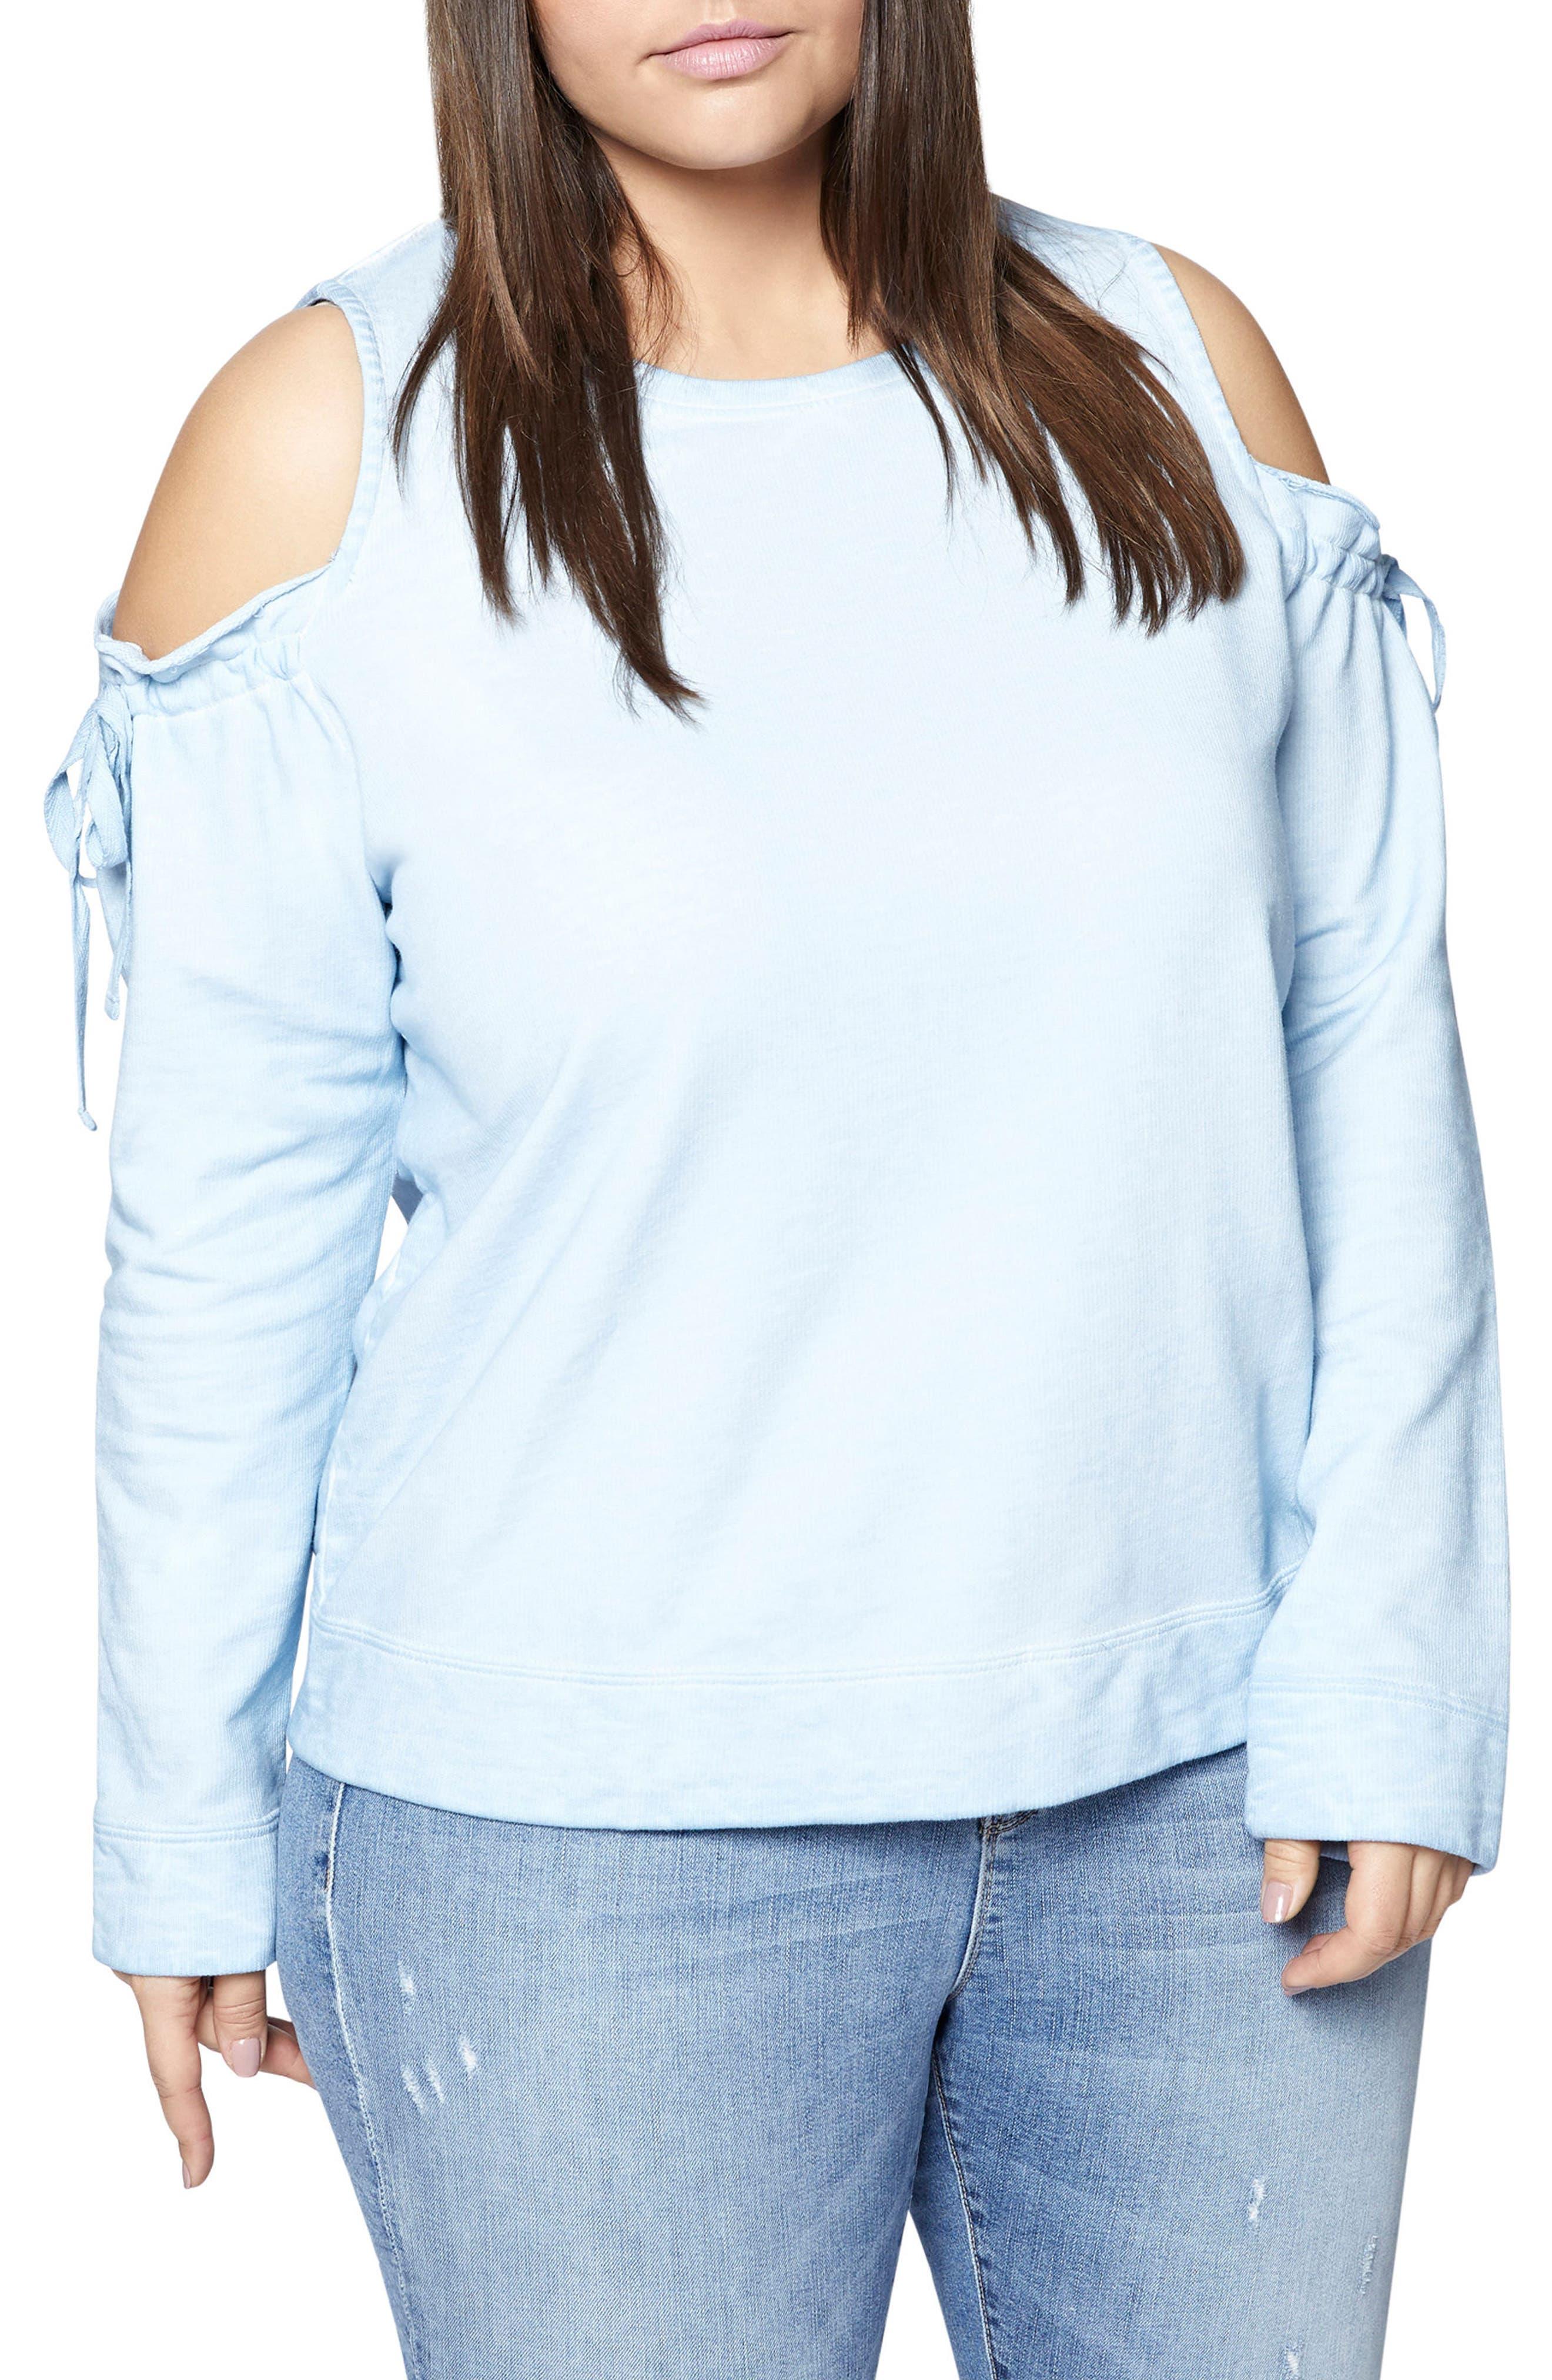 Alternate Image 1 Selected - Sanctuary Parkside Cold Shoulder Sweatshirt (Plus Size)